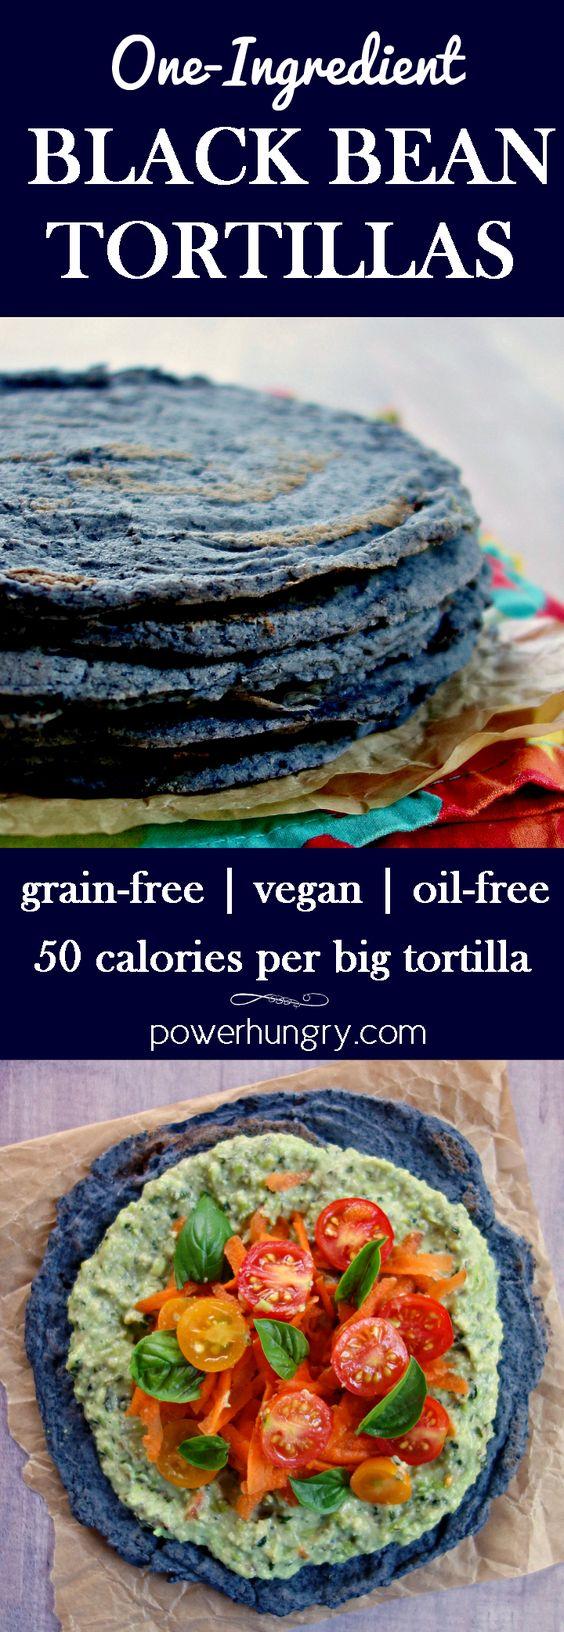 1-Ingredient Black Bean Tortillas {Grain-Free, Vegan}